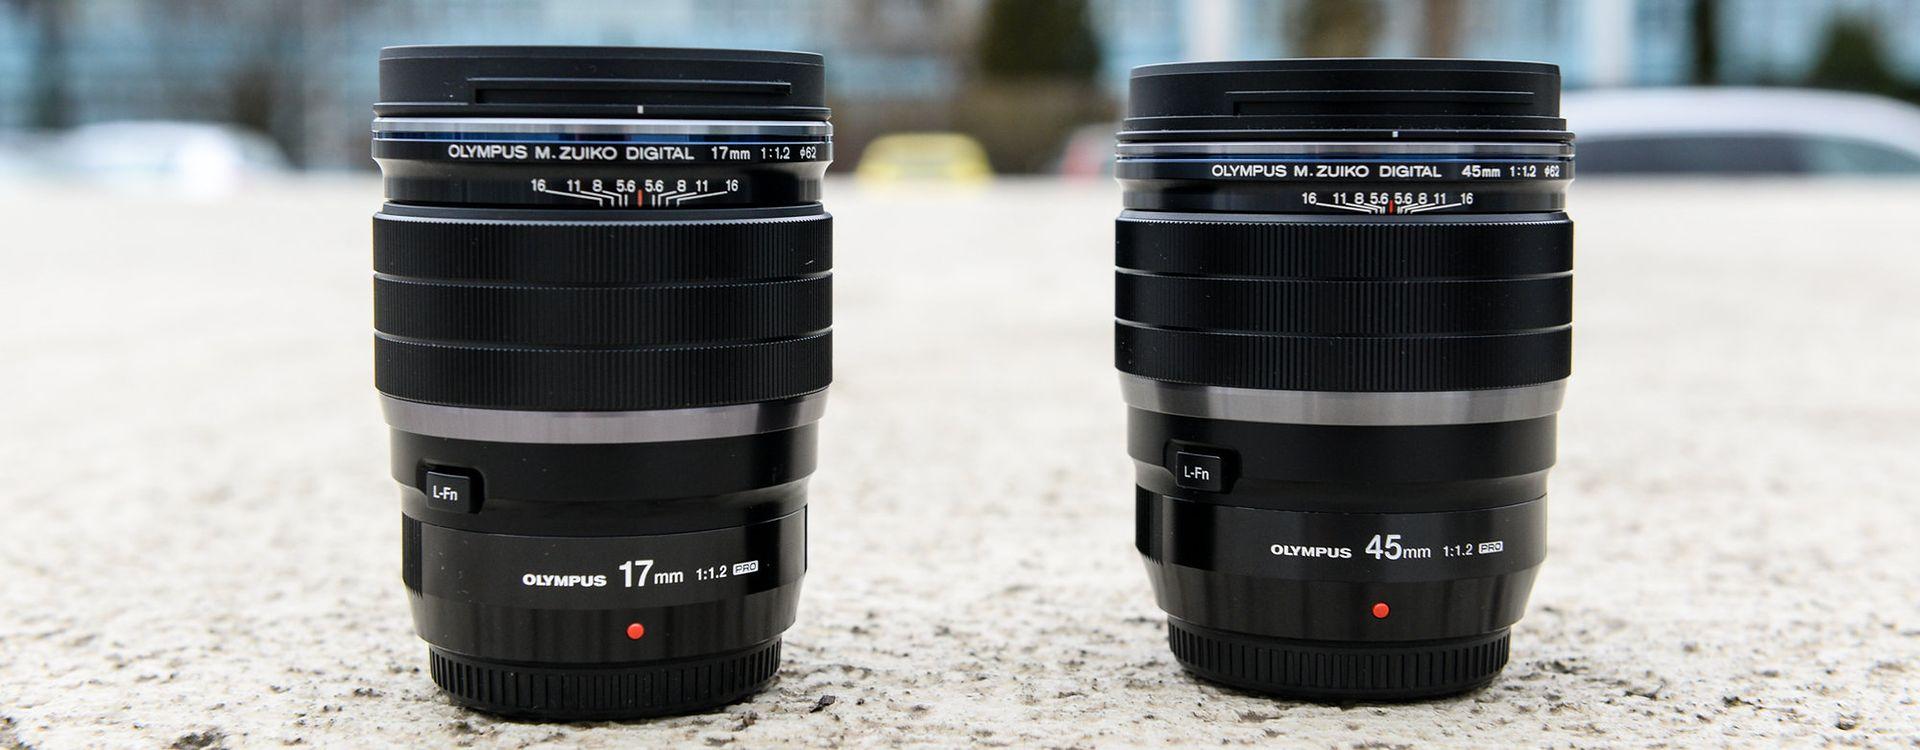 Olympus ED 17 mm f/1.2 PRO oraz 45 mm f/1.2 PRO